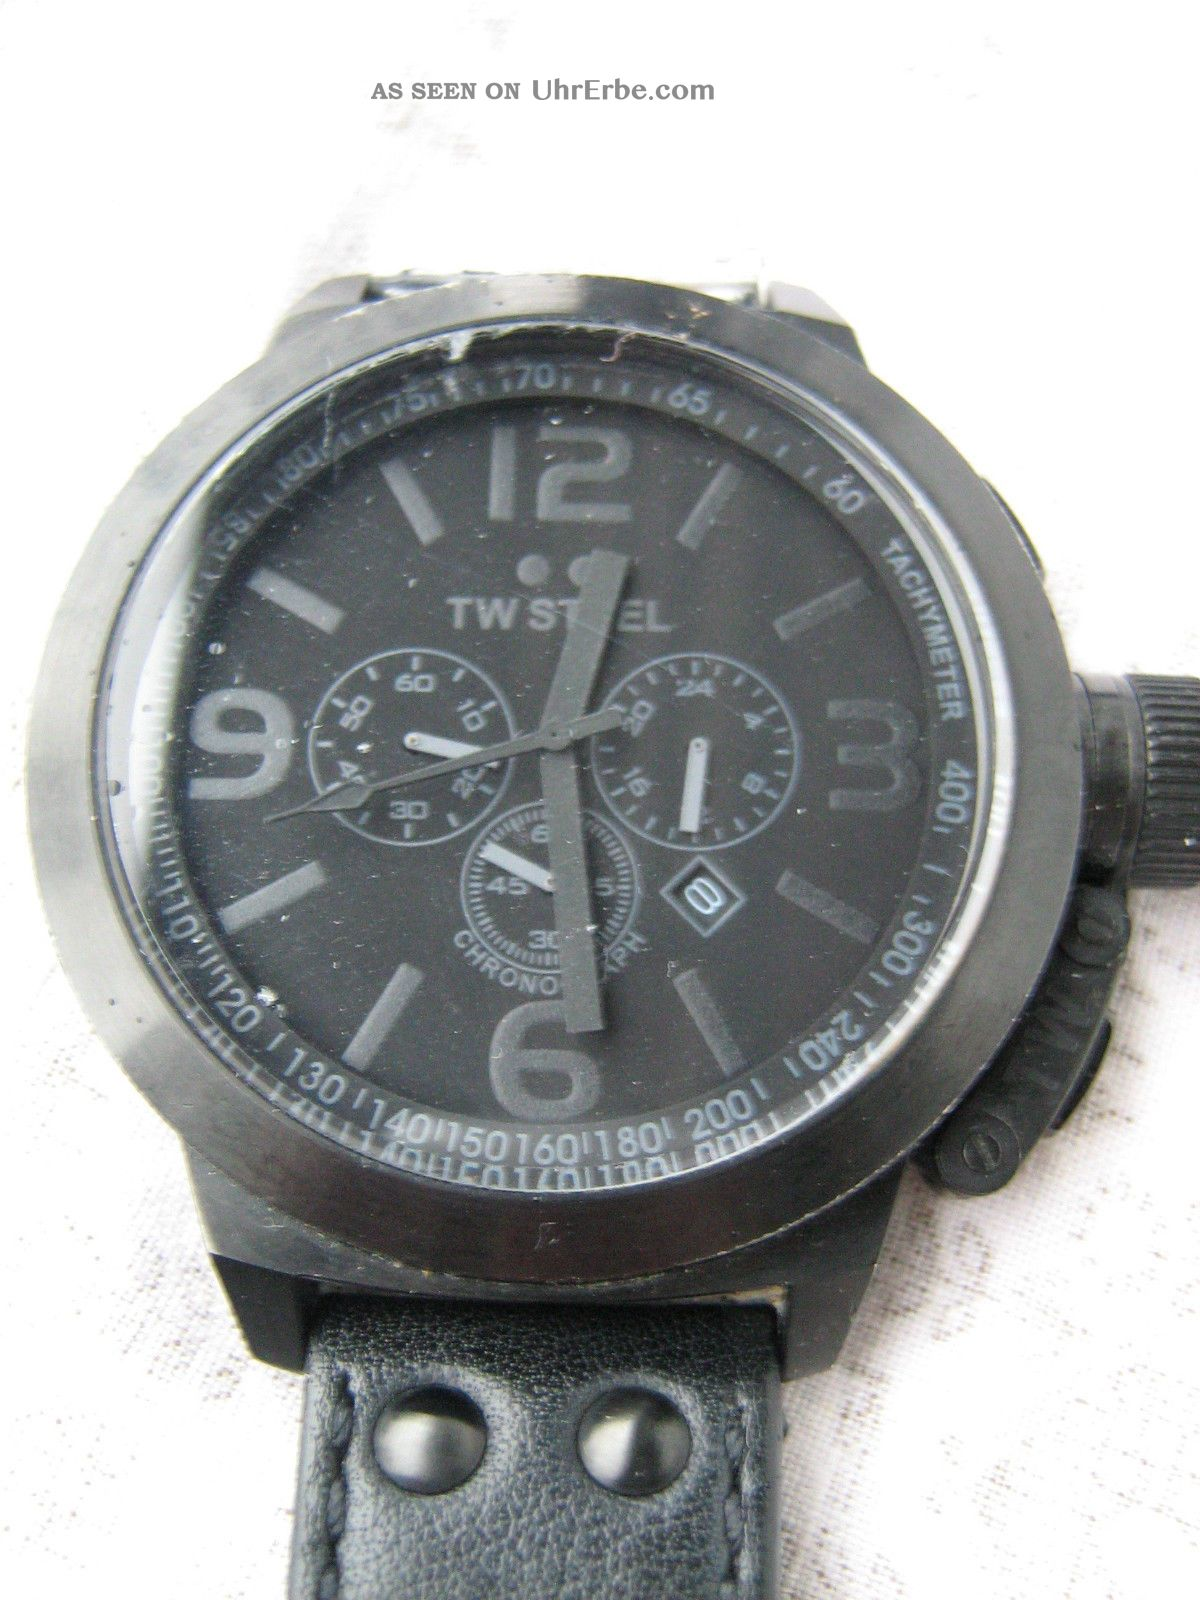 Uhr Armbanduhr Tw Steel Armbanduhren Bild